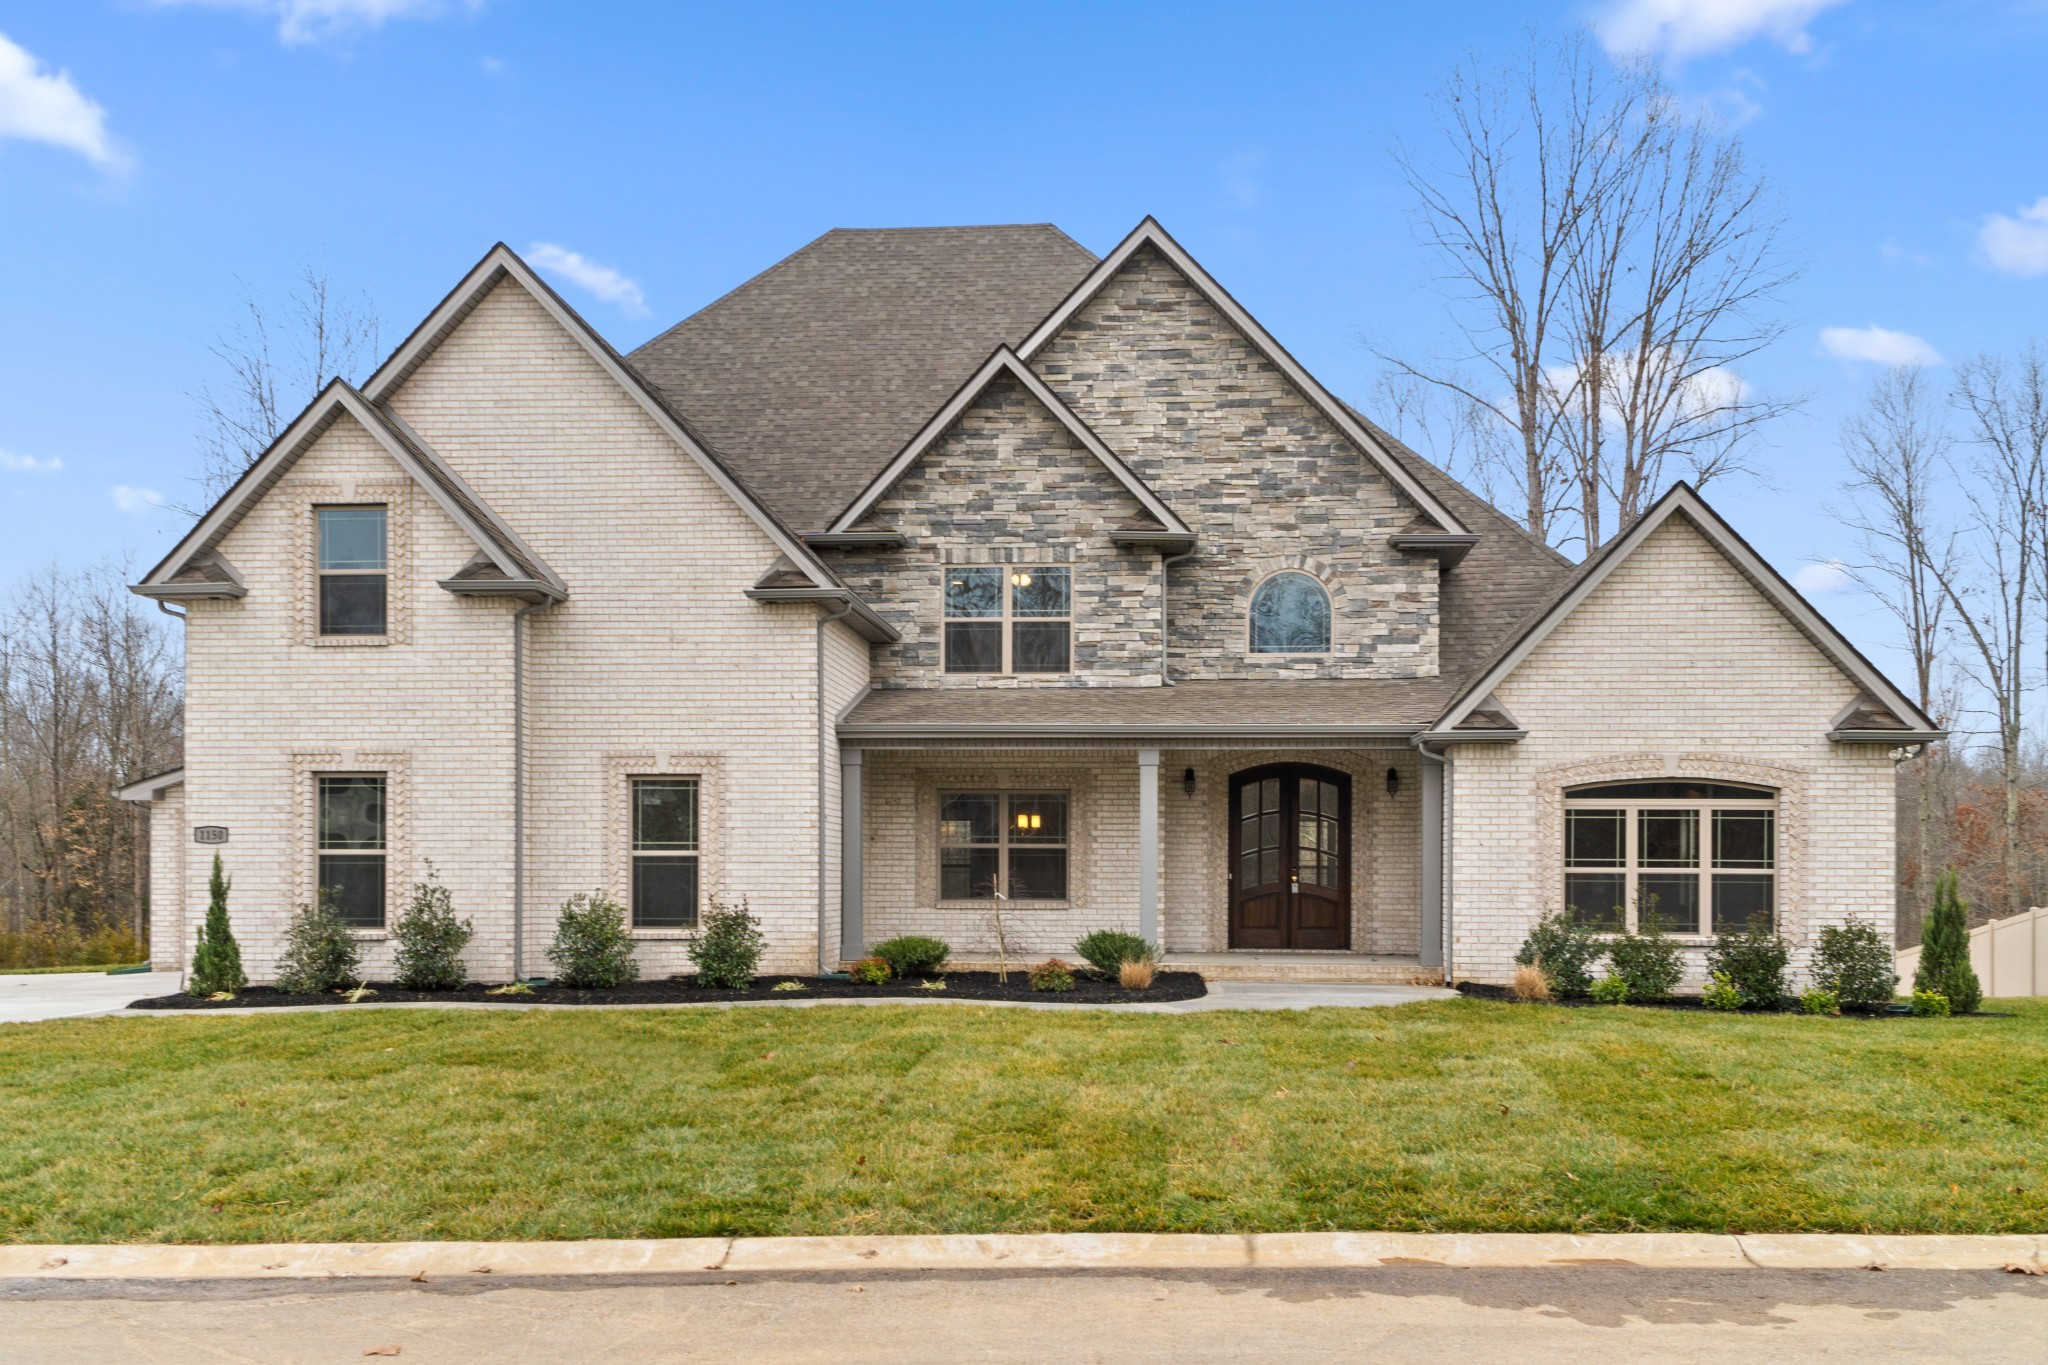 1150 Reda Dr, Clarksville, TN 37042 - Clarksville, TN real estate listing